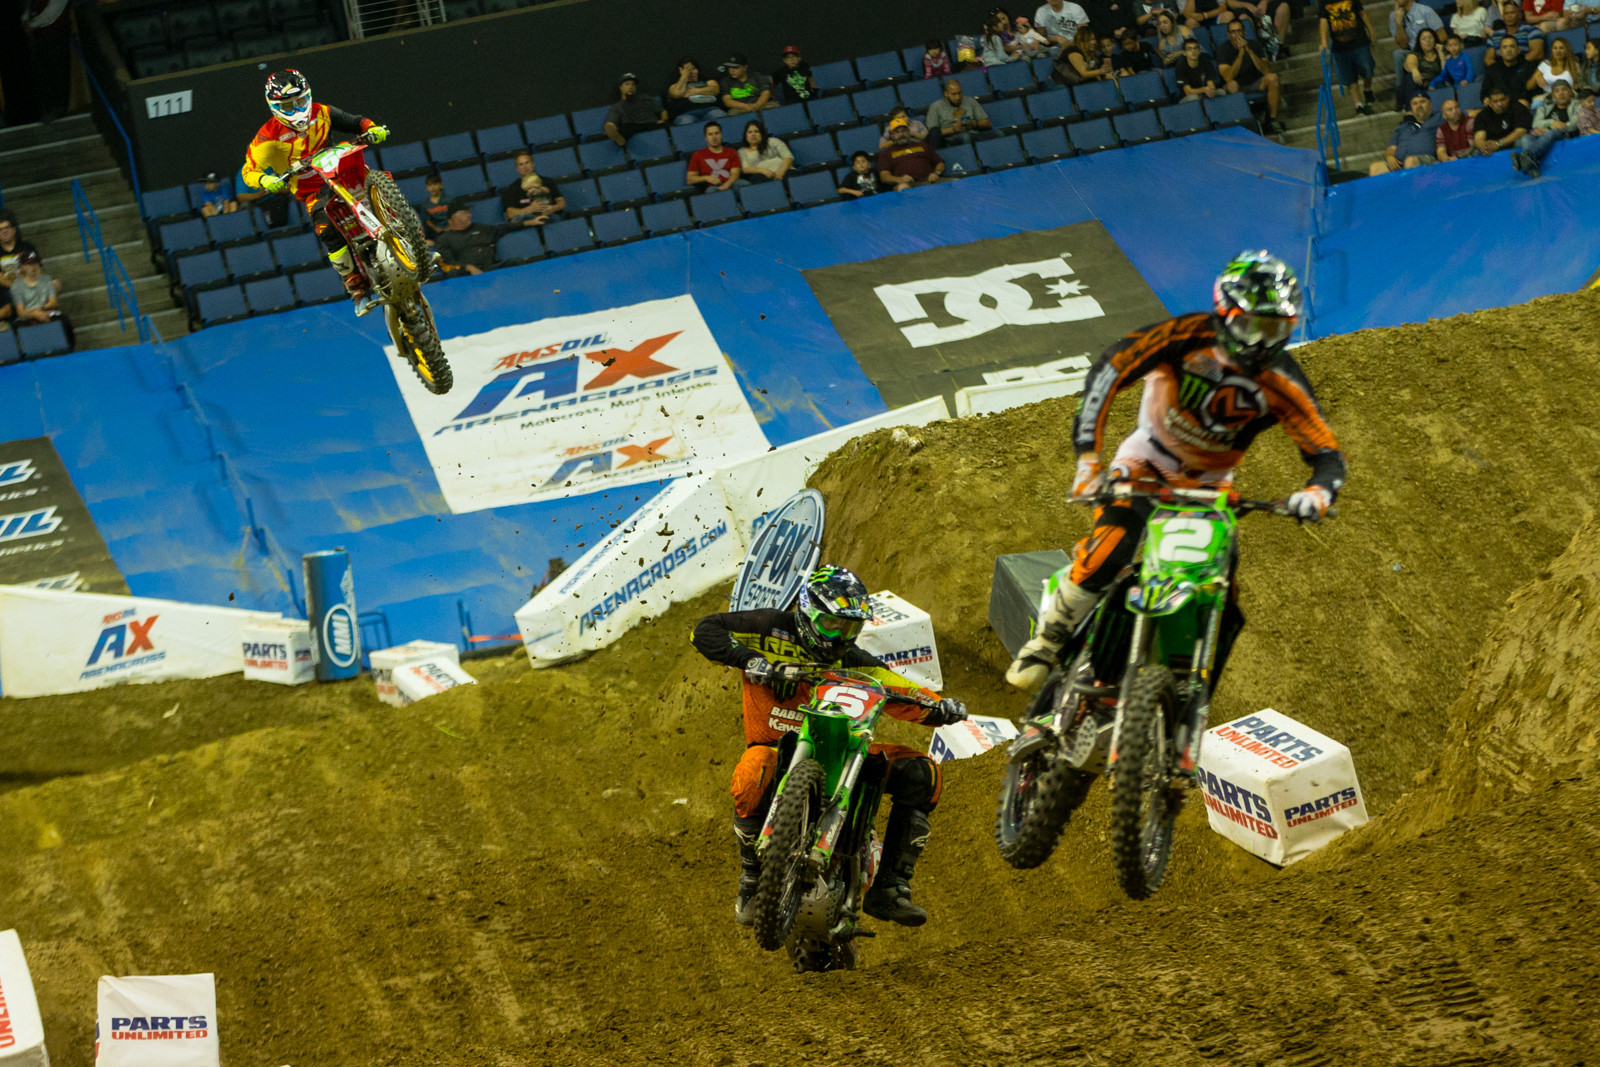 Heat Race - Photo Gallery: Ontario Arenacross - Saturday Night - Motocross Pictures - Vital MX